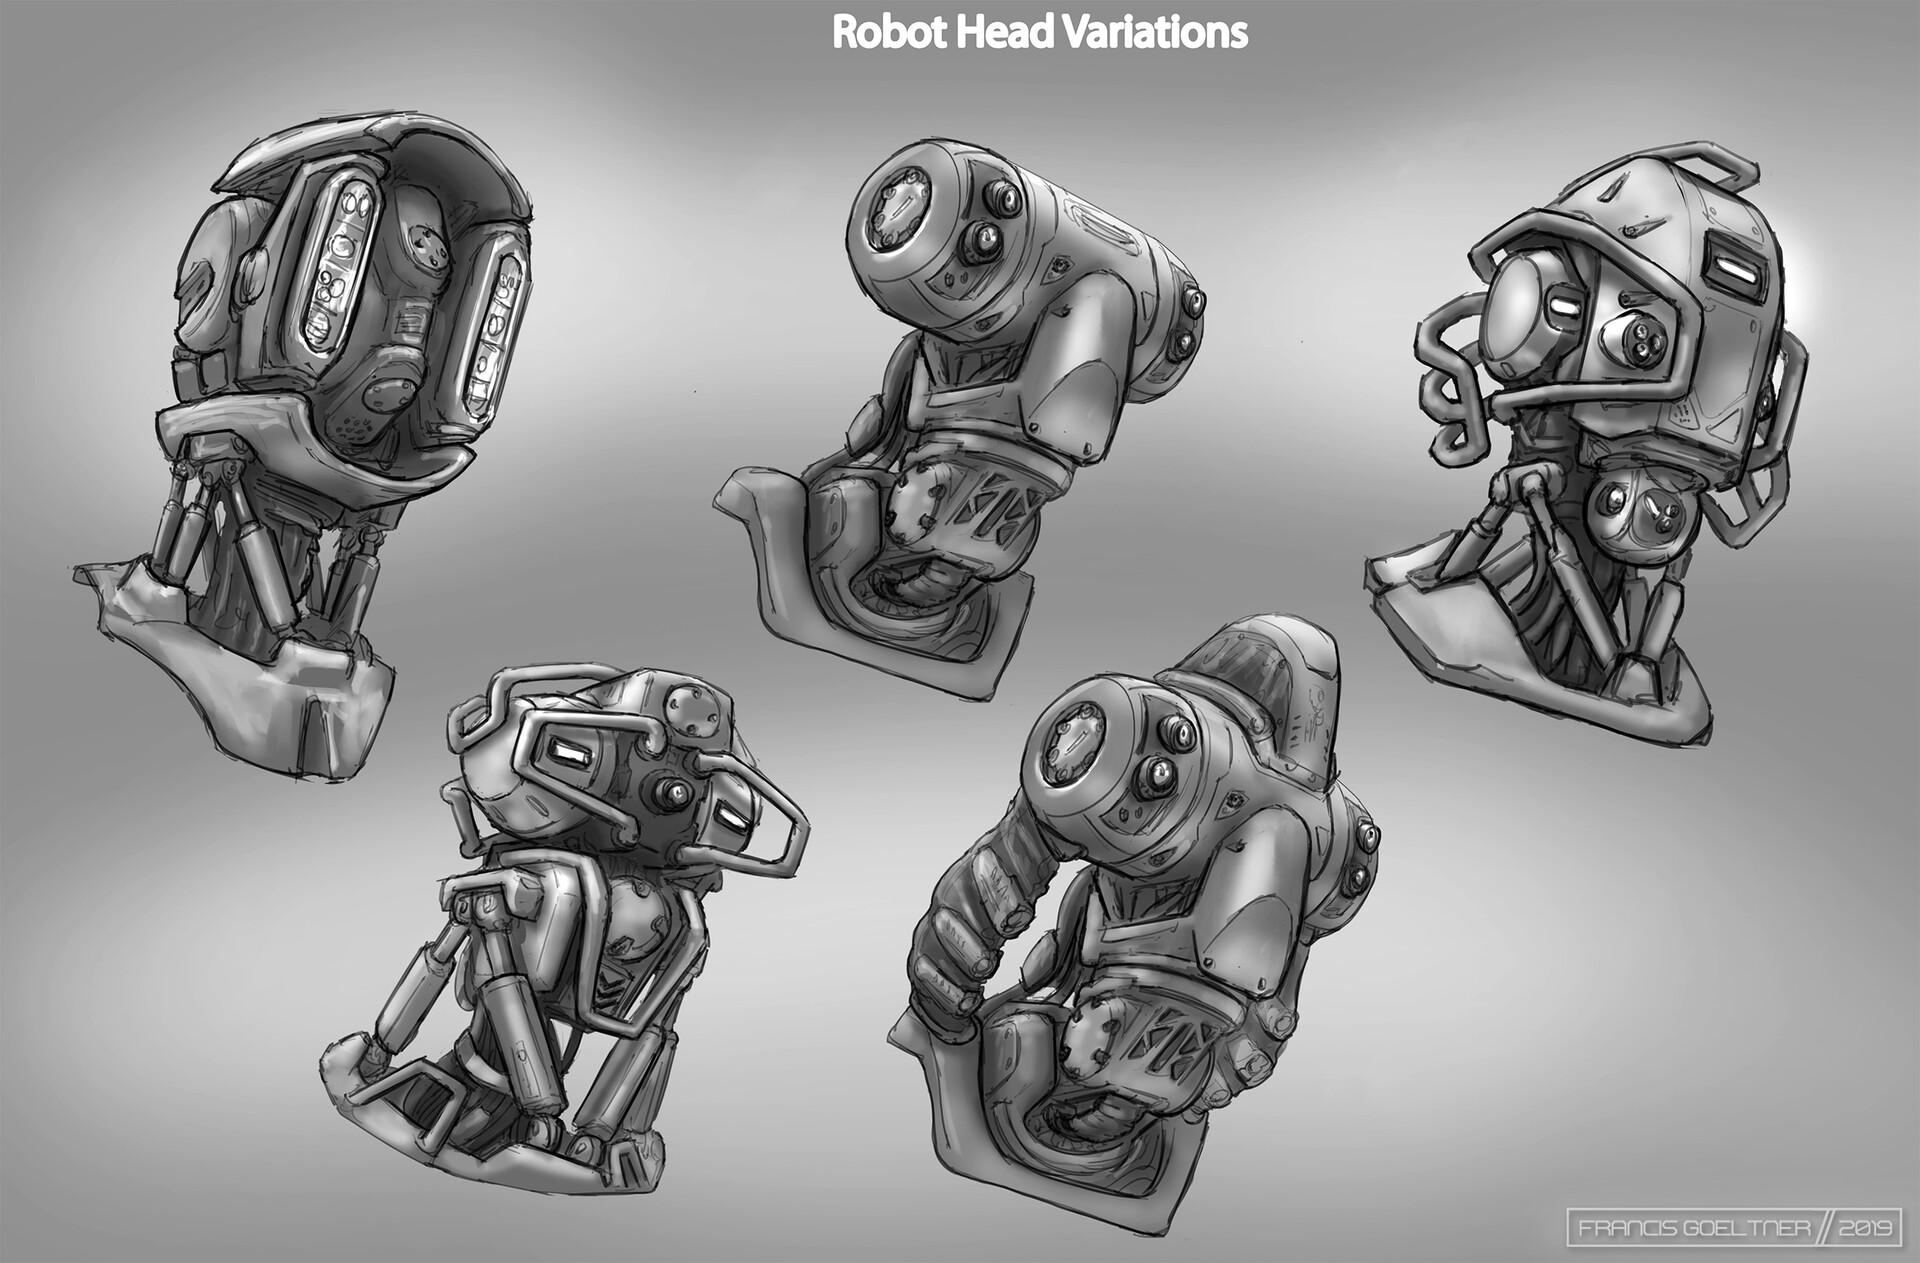 Exploratory sketches of head designs